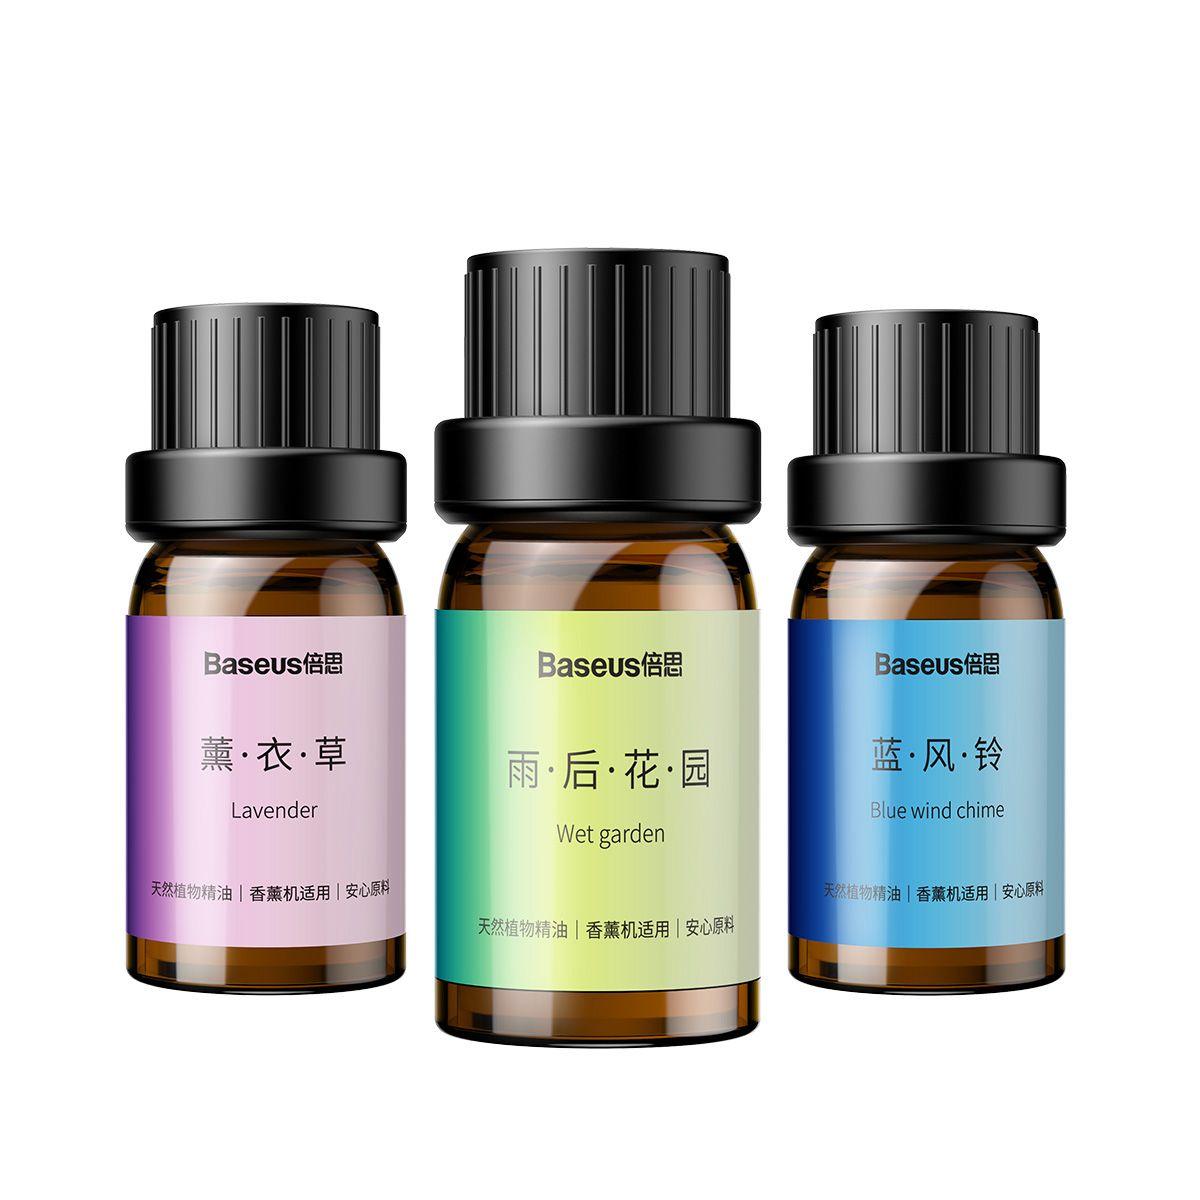 Baseus Essential Oils Perfume Oil Massage Natural Perfume Oil Skin